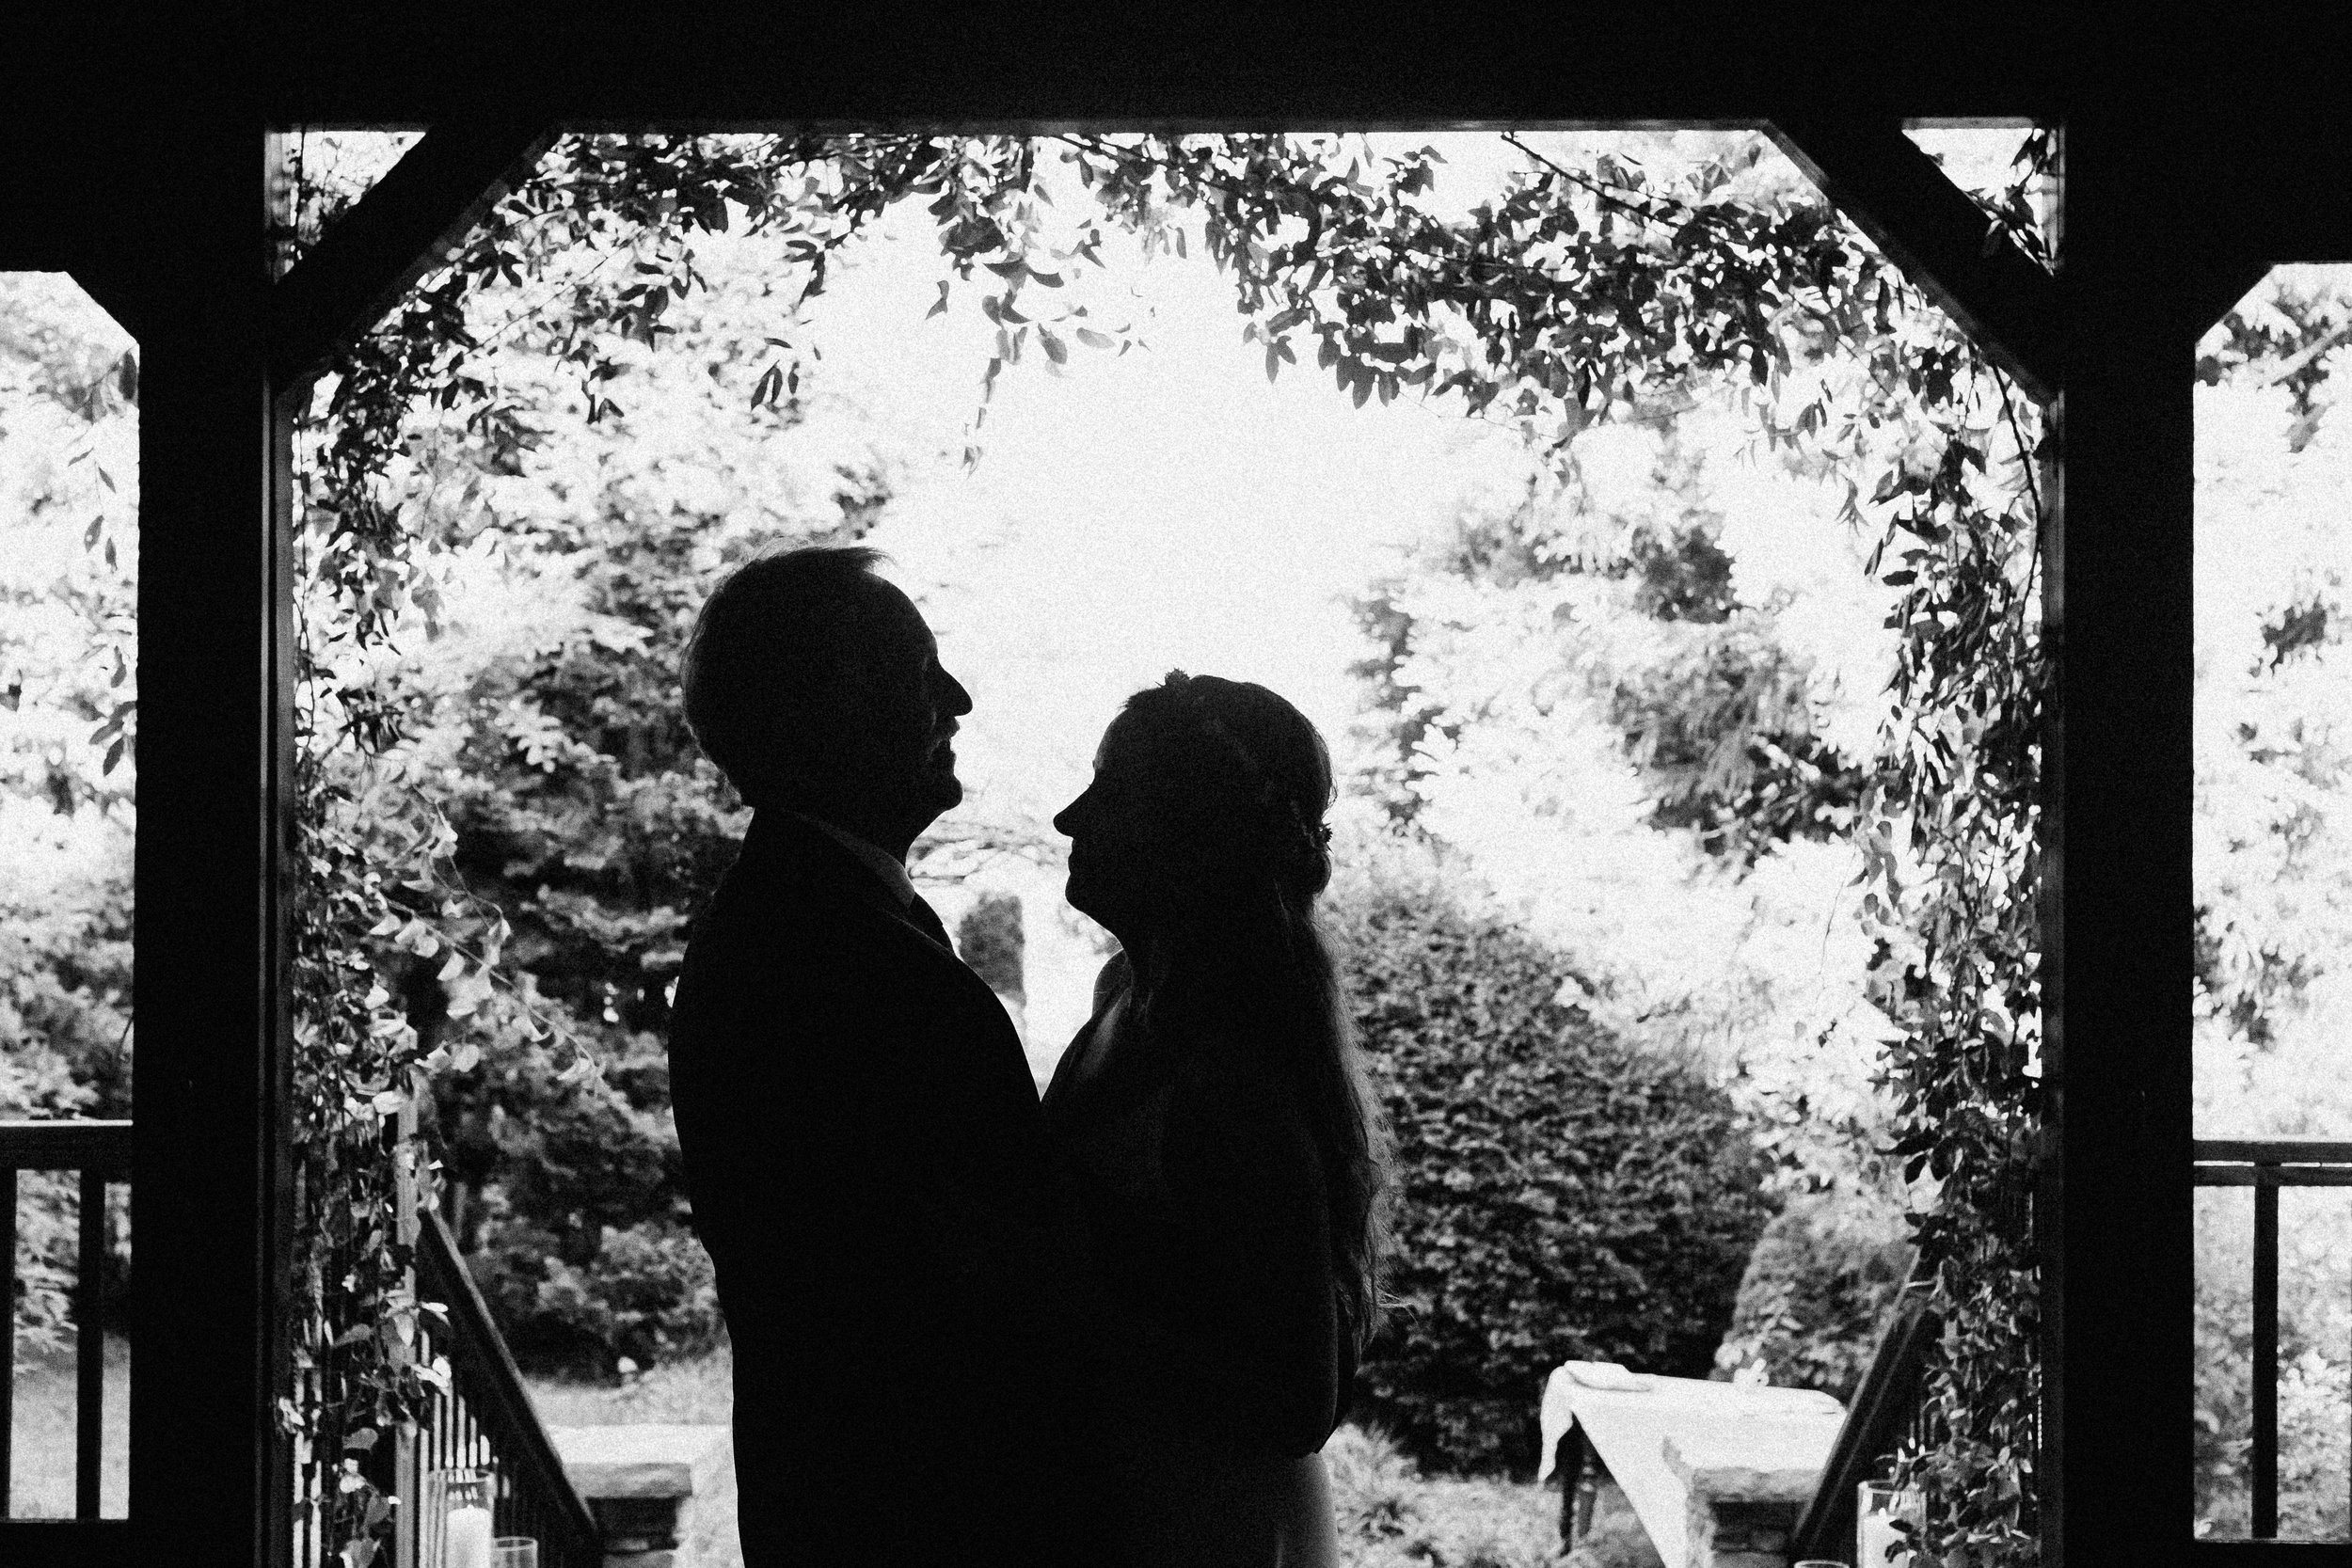 glen_ella_meadow_creekside_atlanta_wedding_photographers_2012.jpg